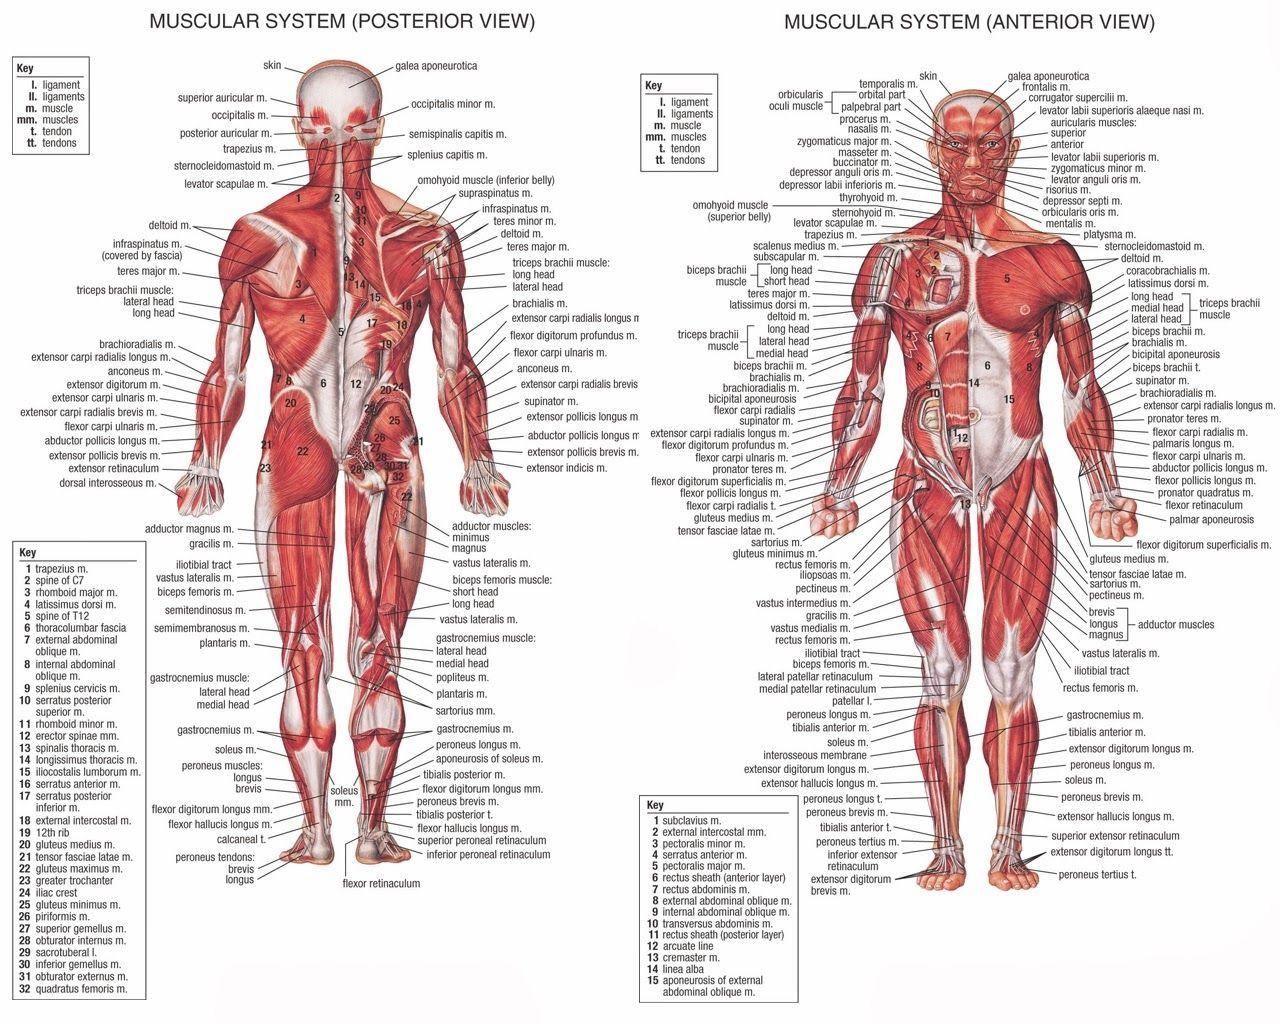 muscle map of human body muscle map human body - human anatomy, Muscles